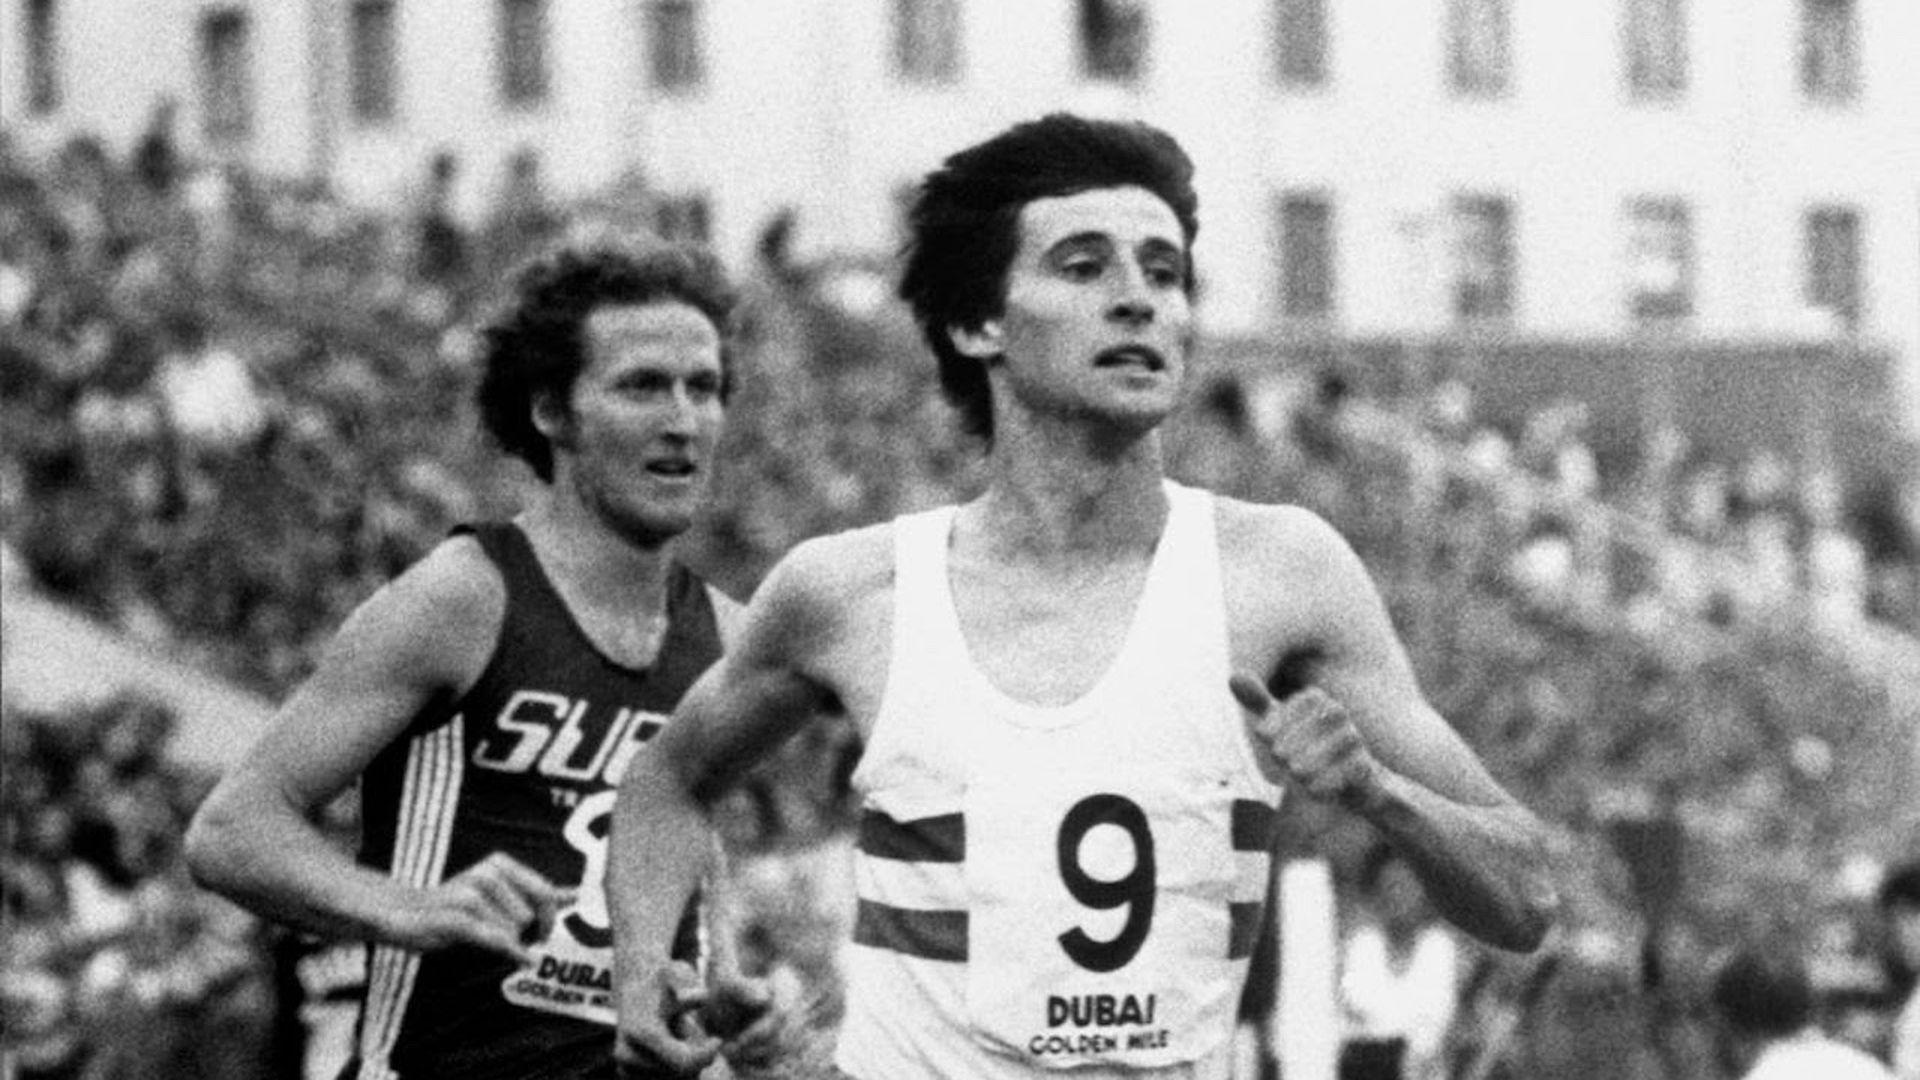 British runner Sebastian Coe